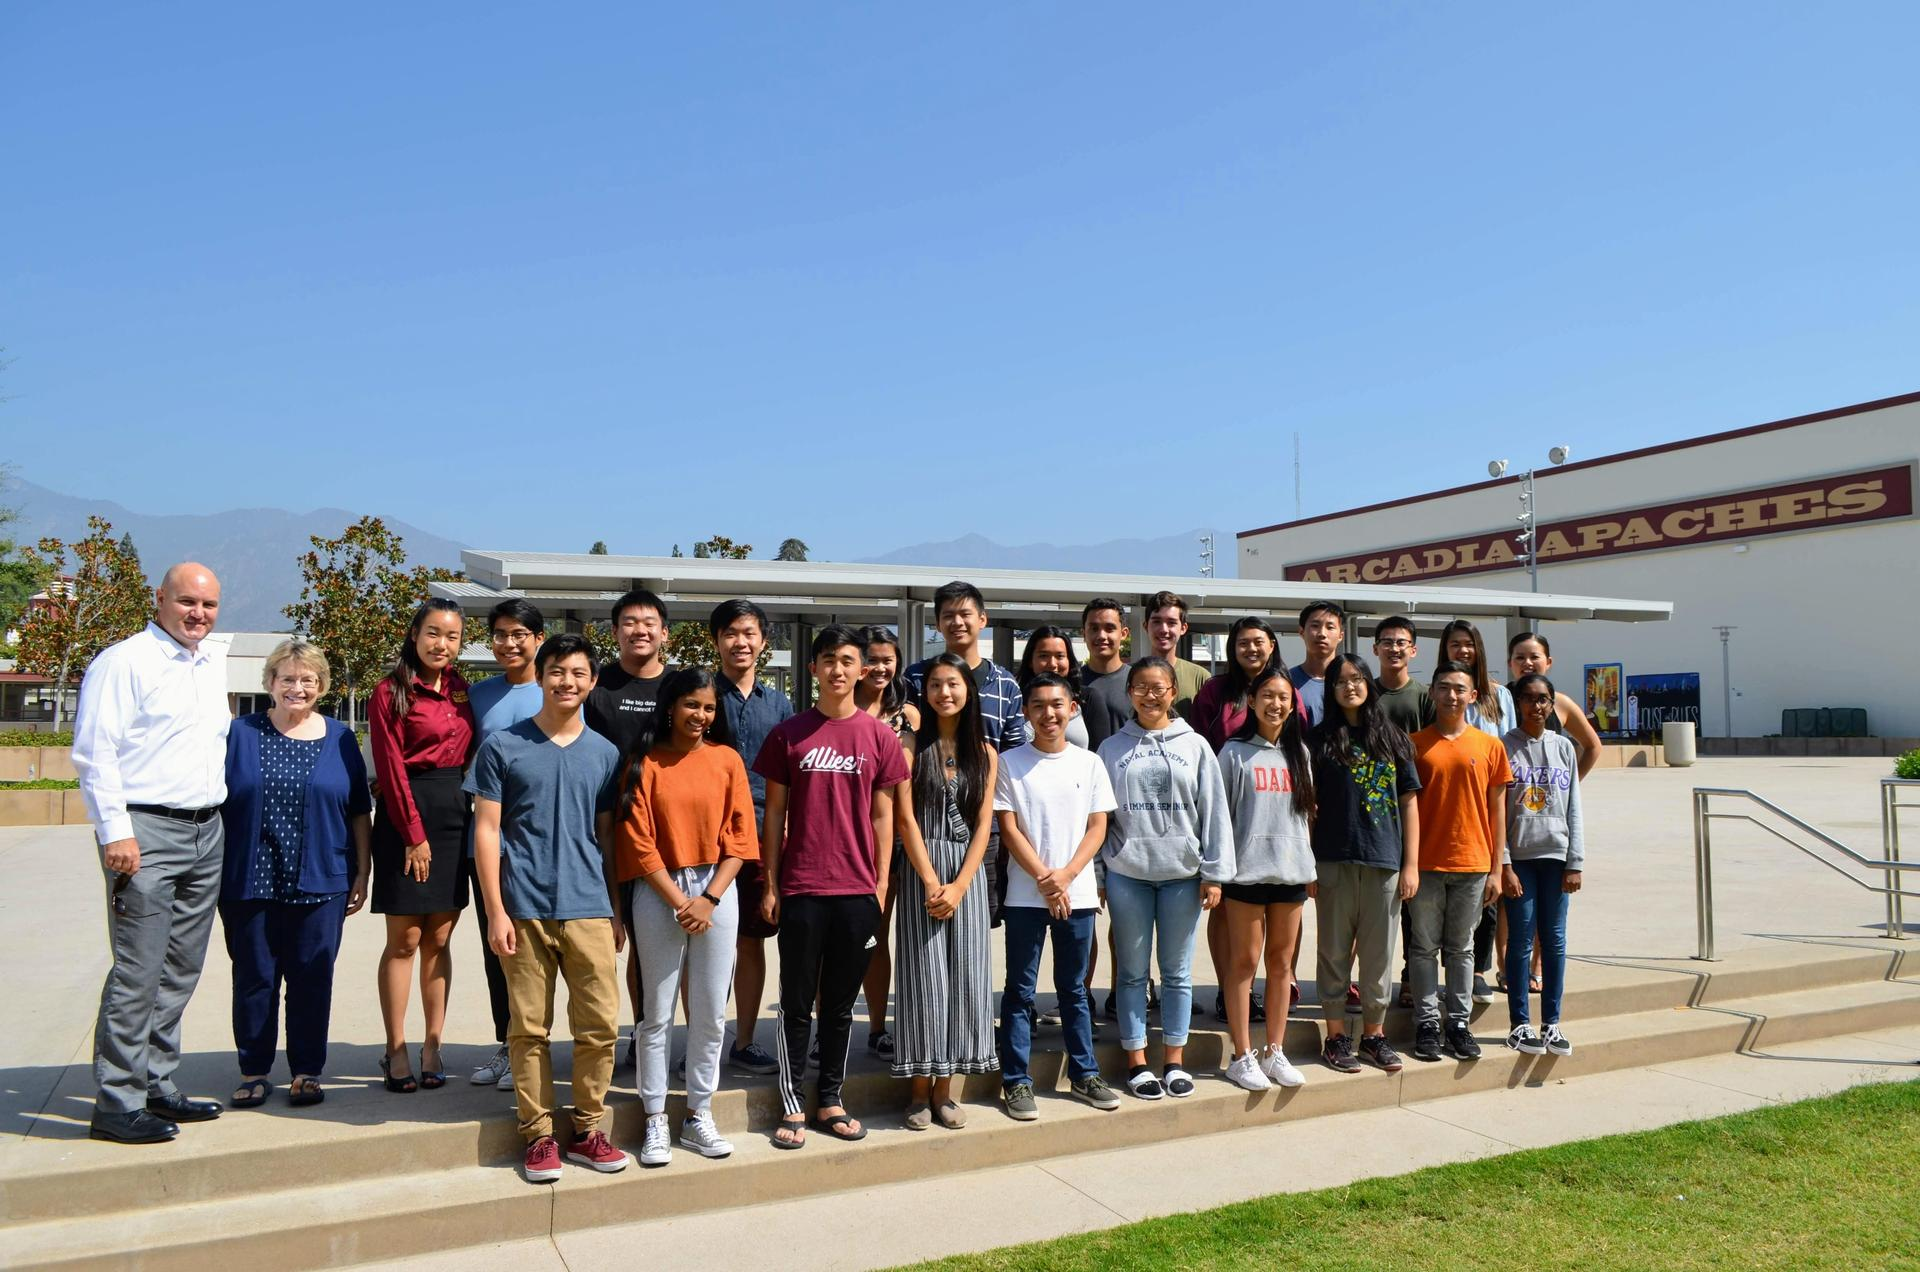 23 Arcadia High Students Named National Merit Scholarship